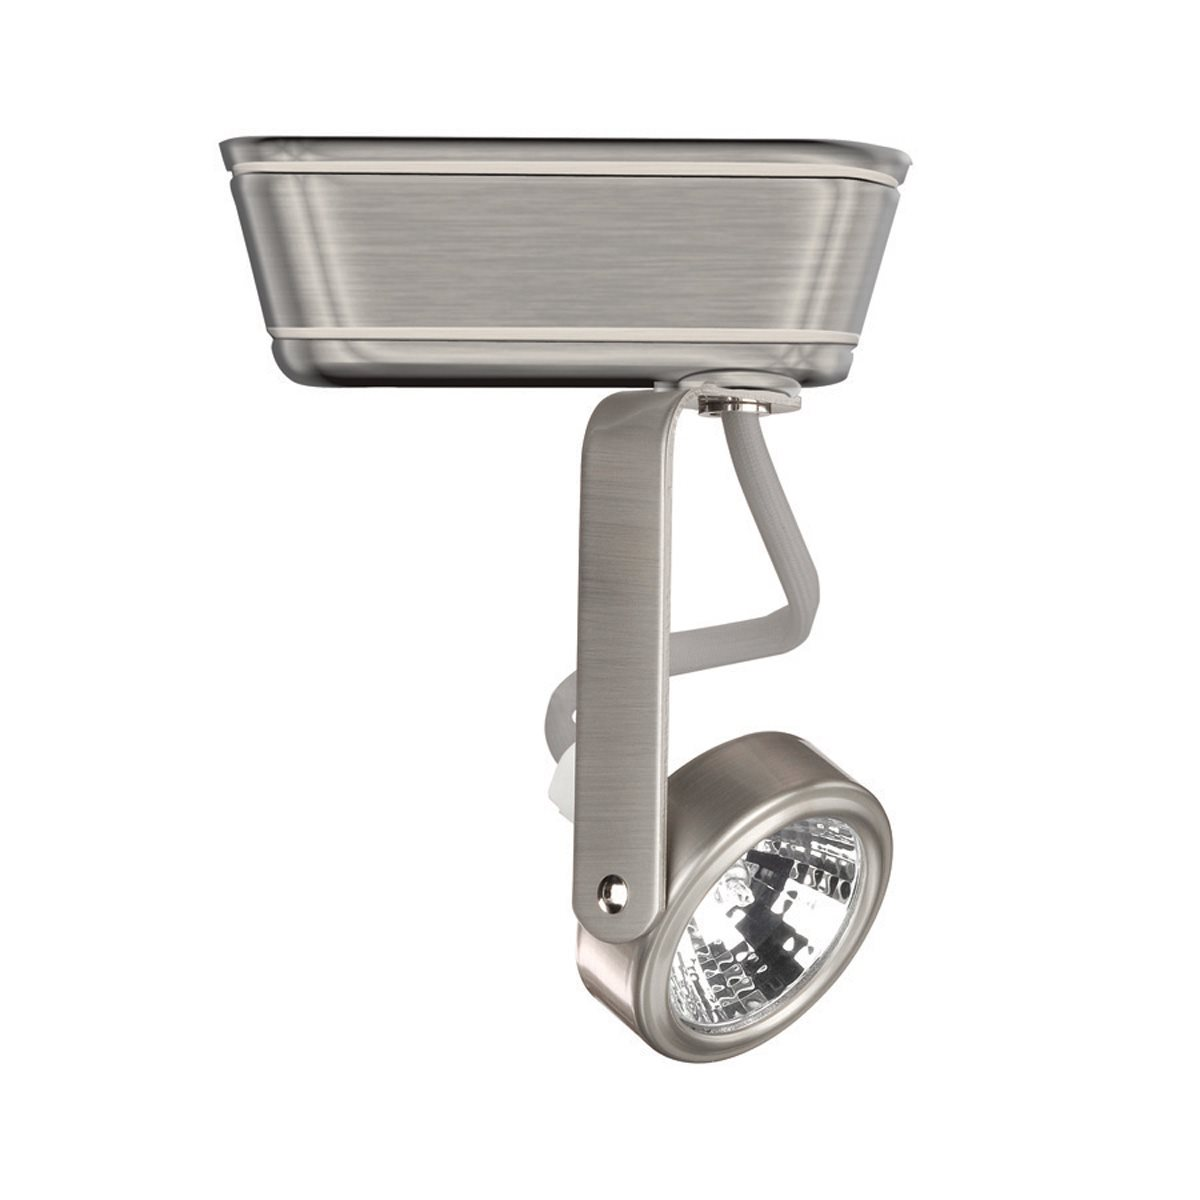 W.A.C. Lighting 180 Low Voltage Track Light Fixture WAC-180